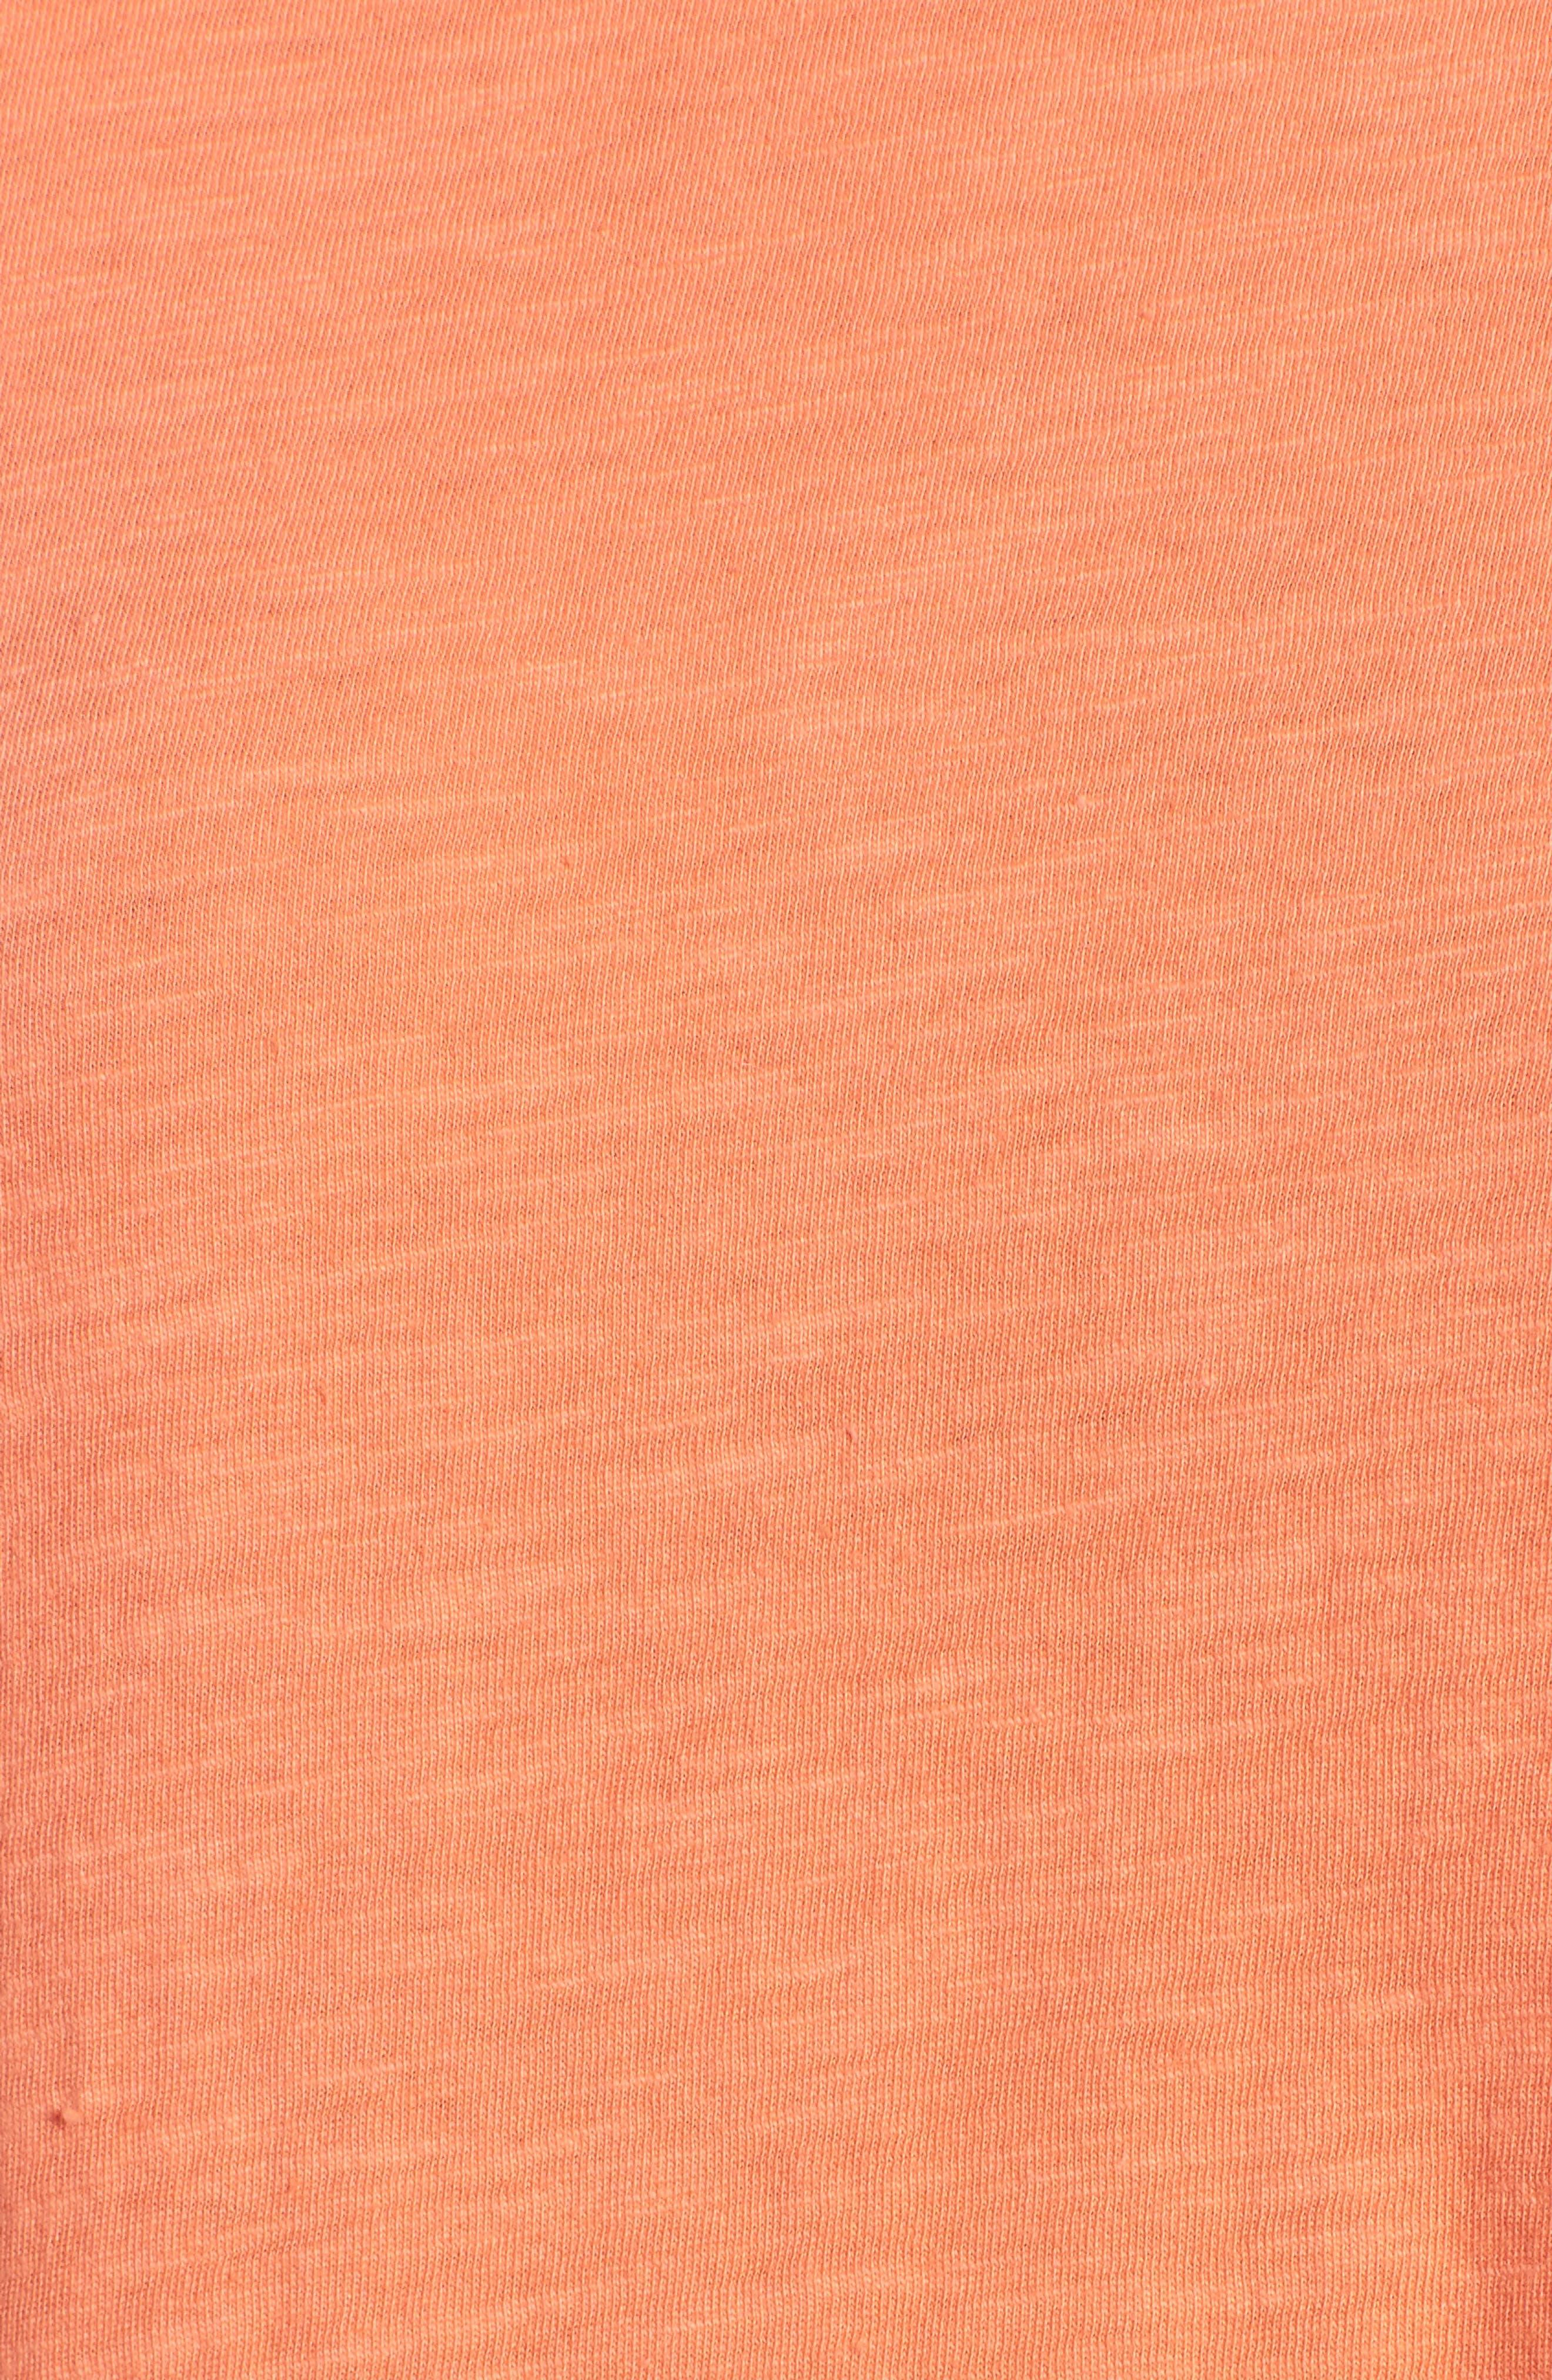 Organic Cotton Knit Top,                             Alternate thumbnail 45, color,